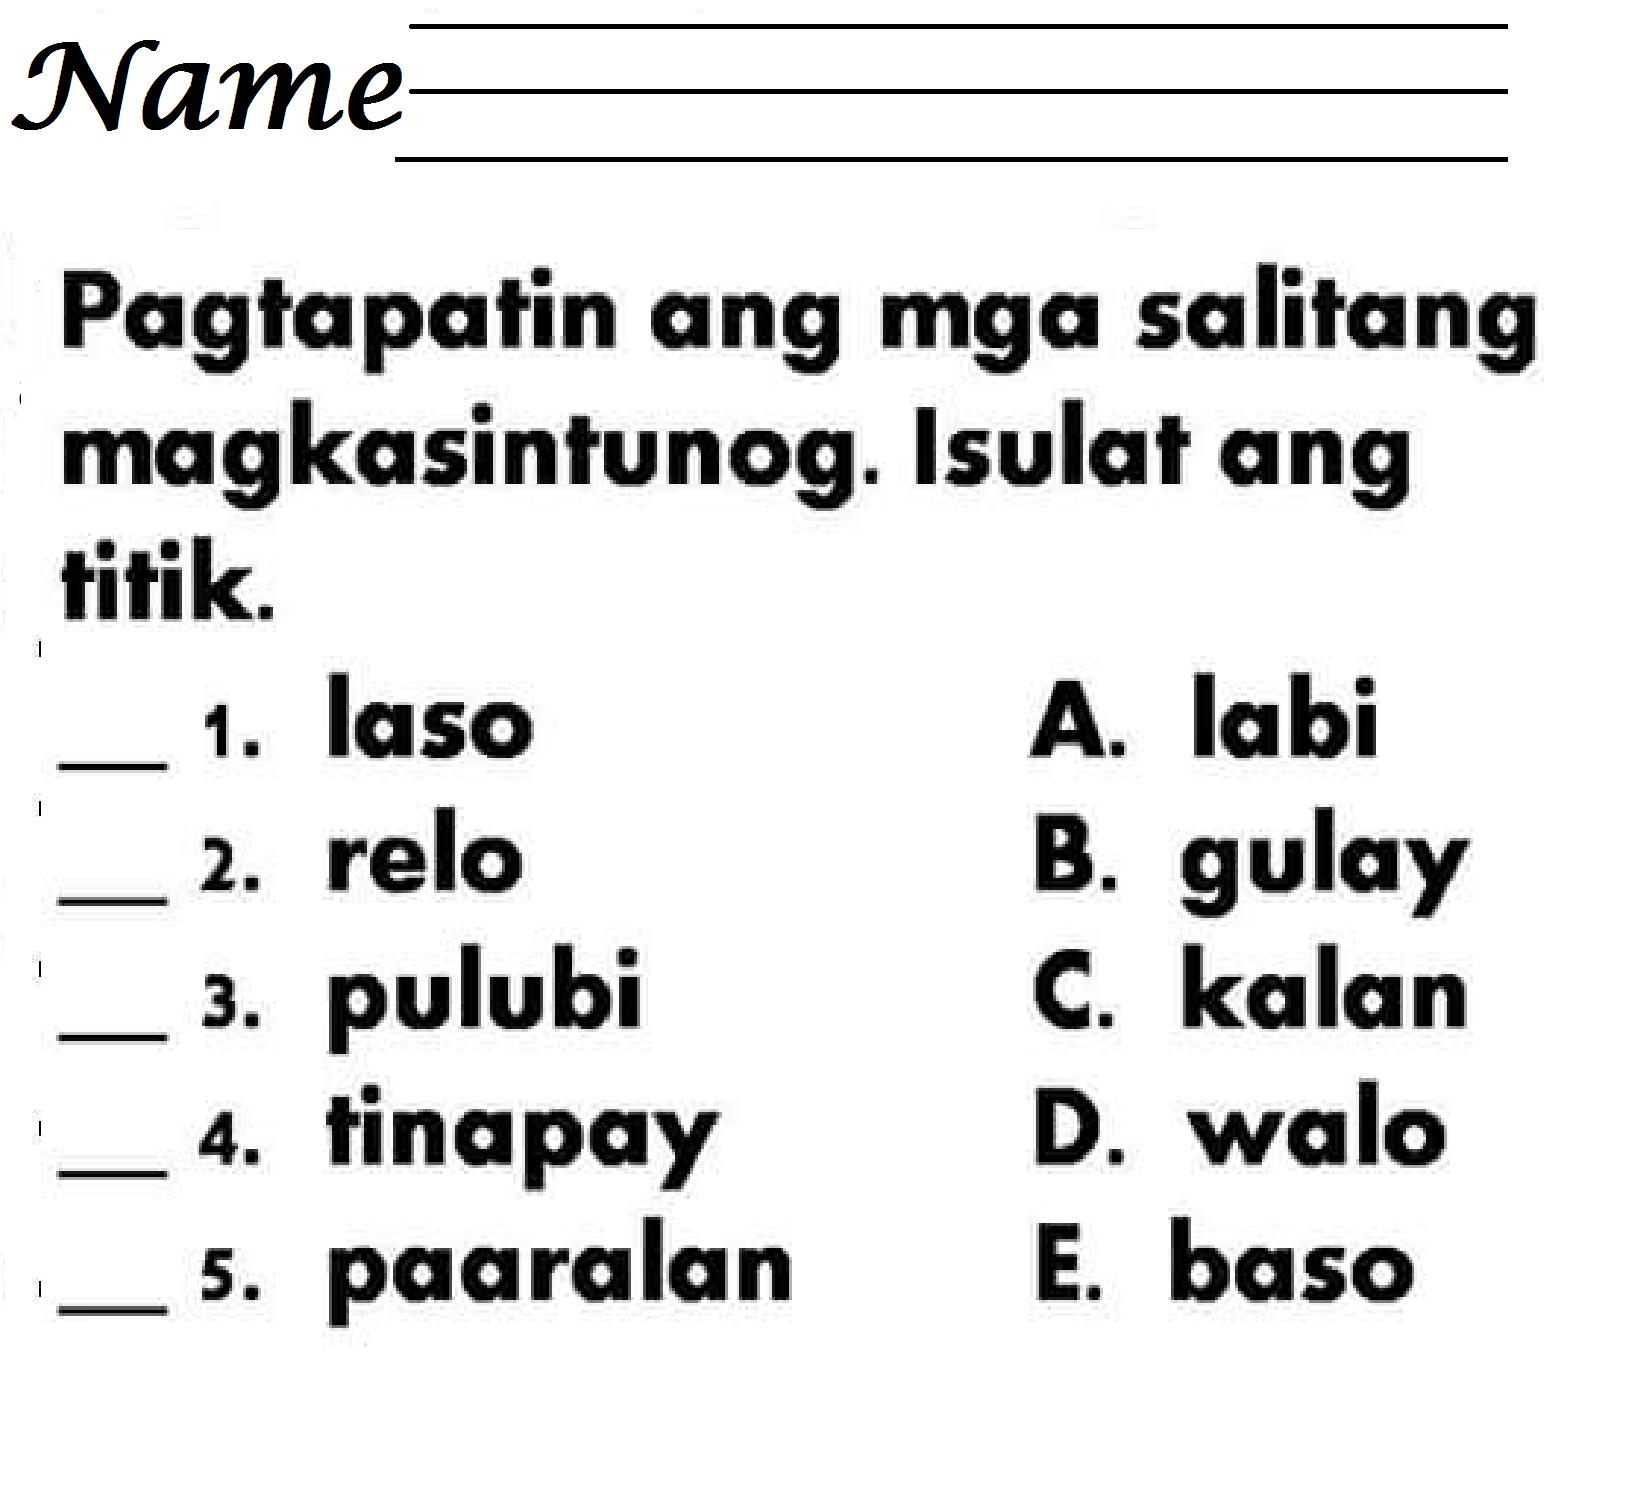 medium resolution of 12 Mother Tongue Basic (Tagalog) ideas   tagalog